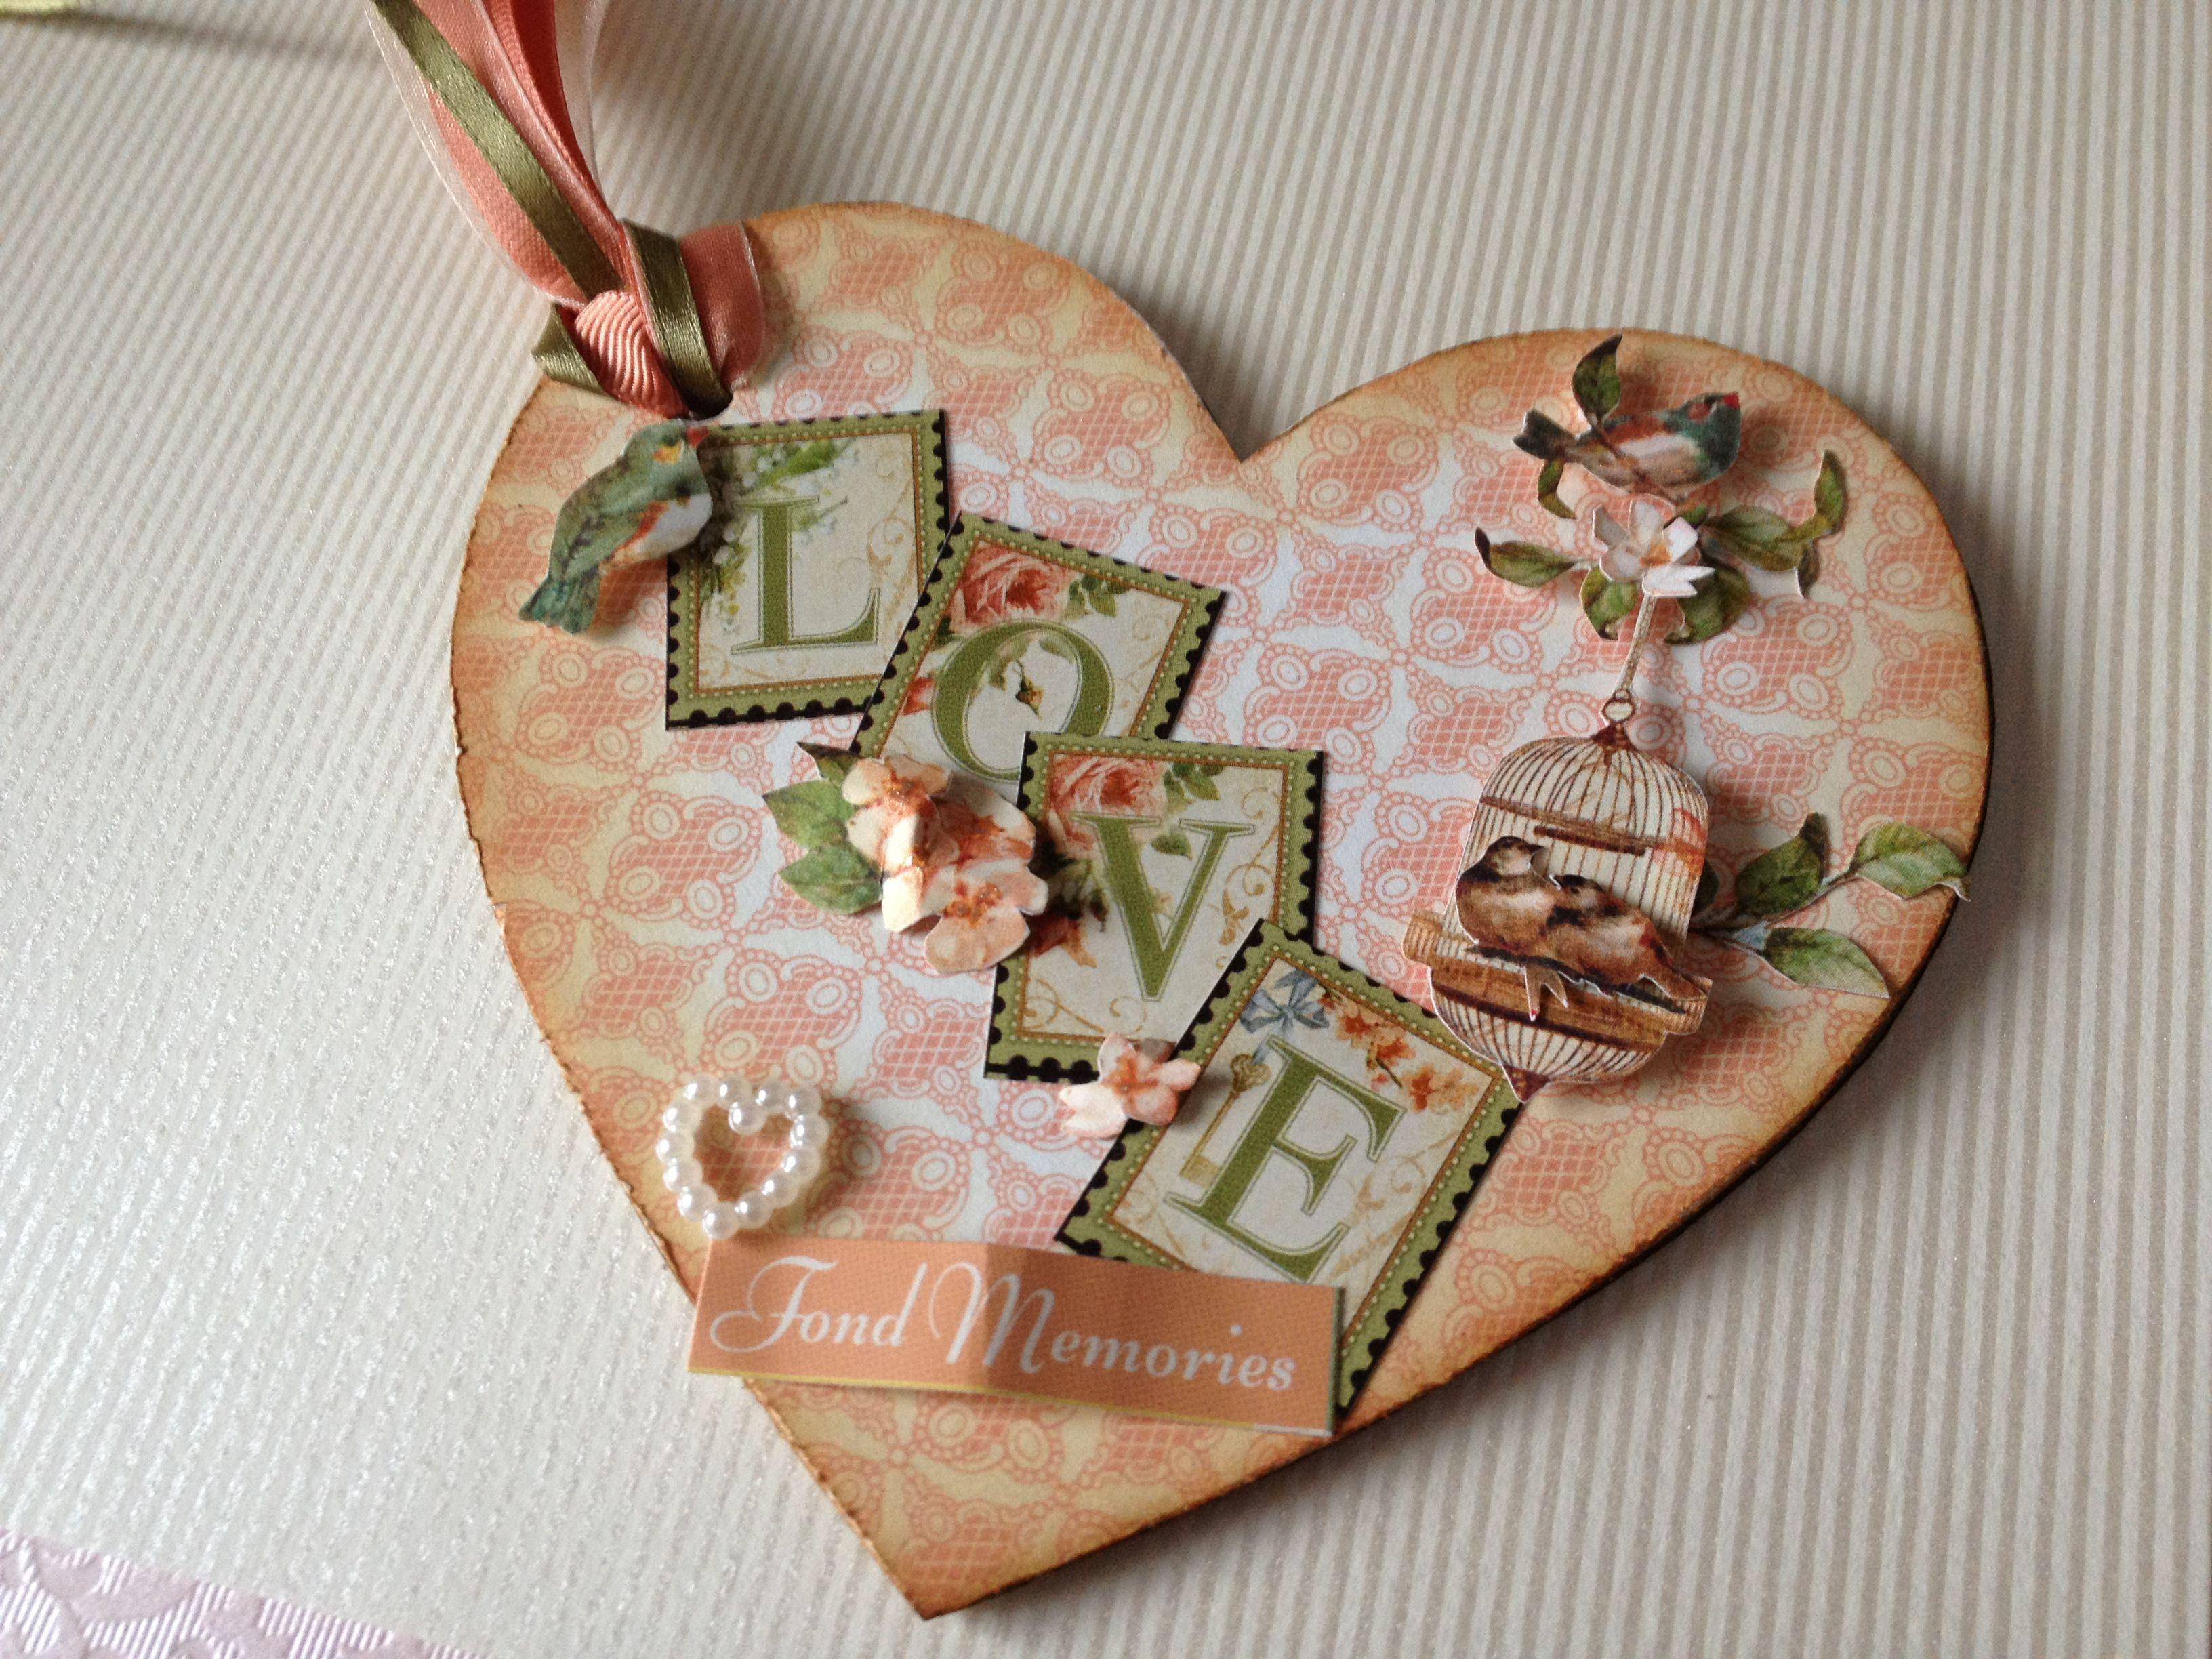 Secret garden chipboard heart with lots of fussy cutting